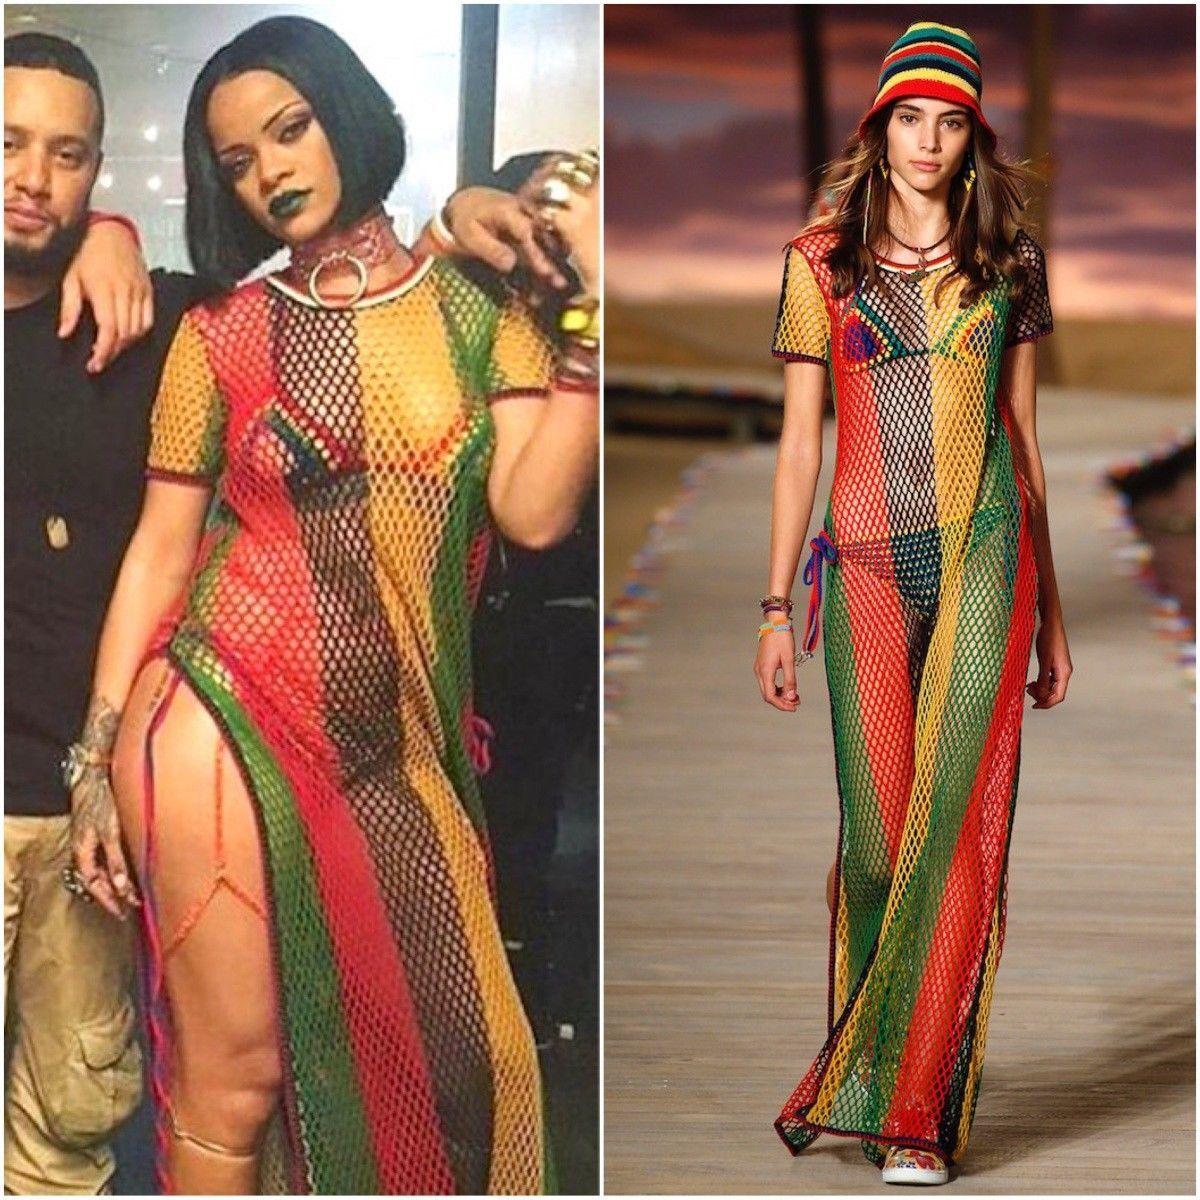 Womens Cotton crochet midi bodycon dress reggae rasta see through XS XL 10 12 14